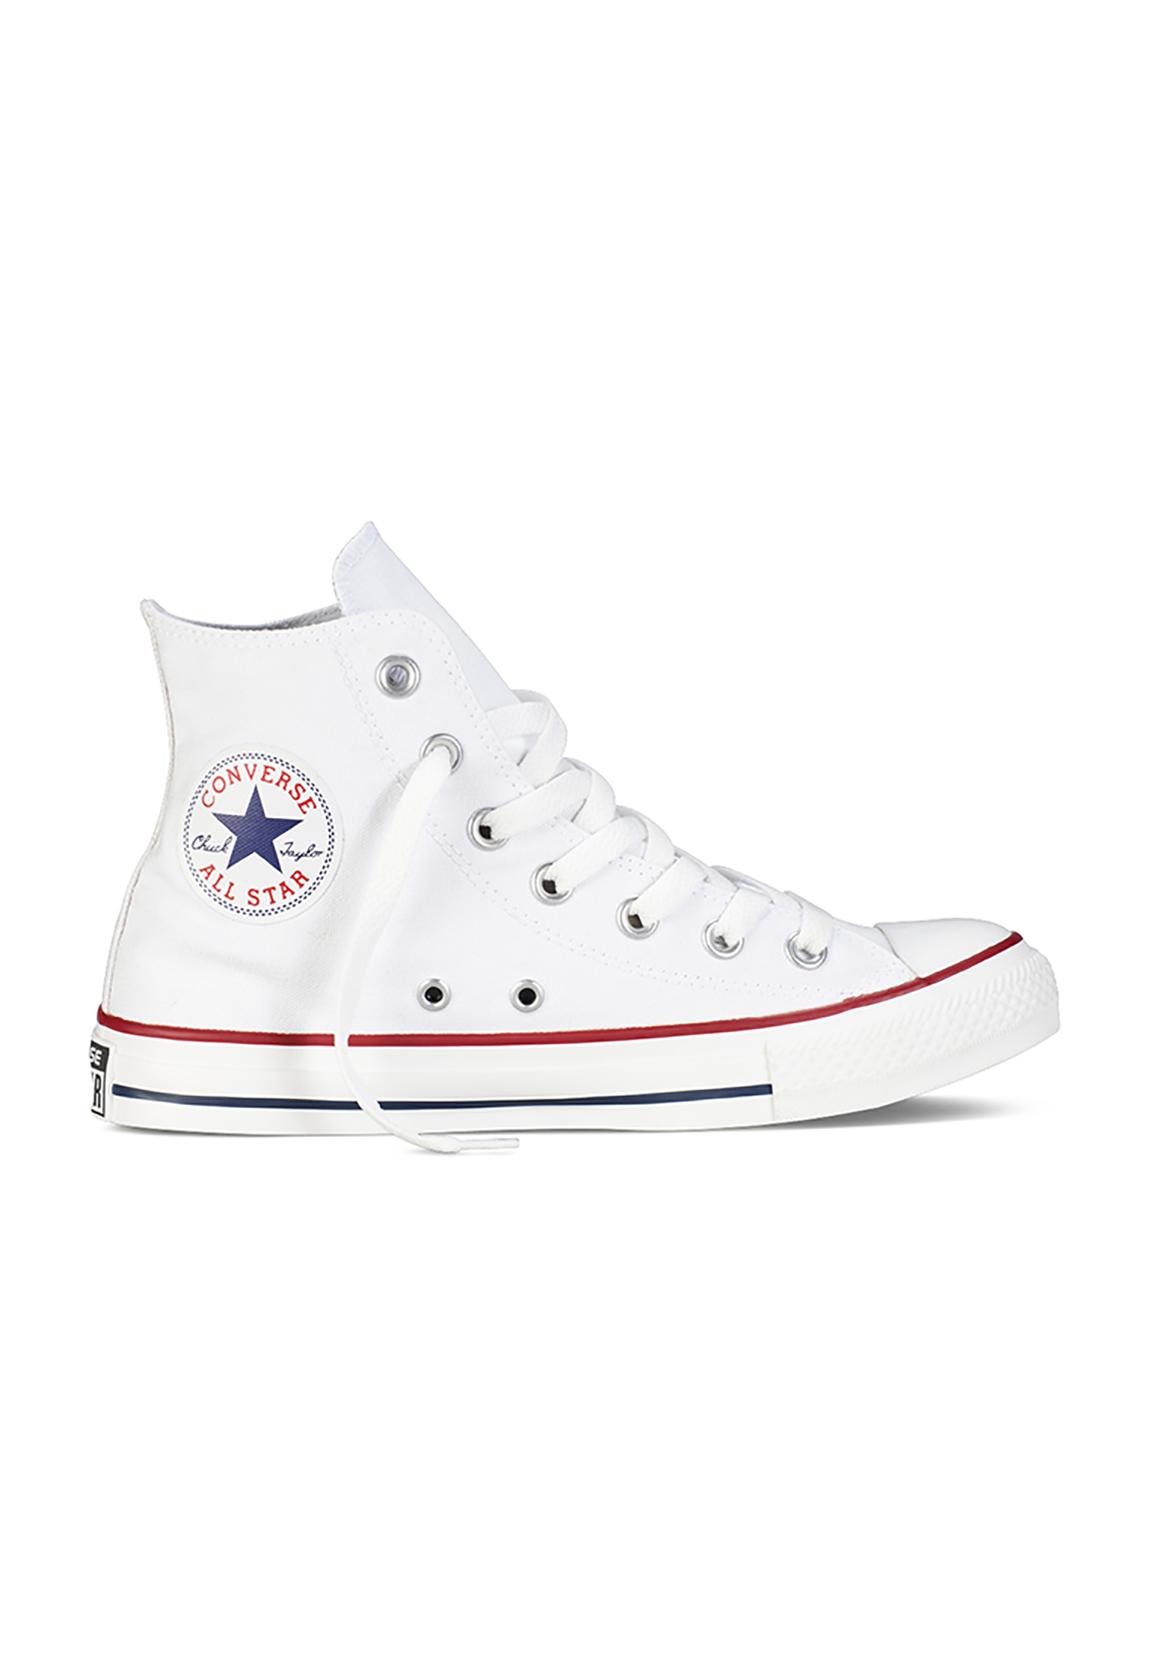 All Star Hi Converse Basic Chucks Weiss